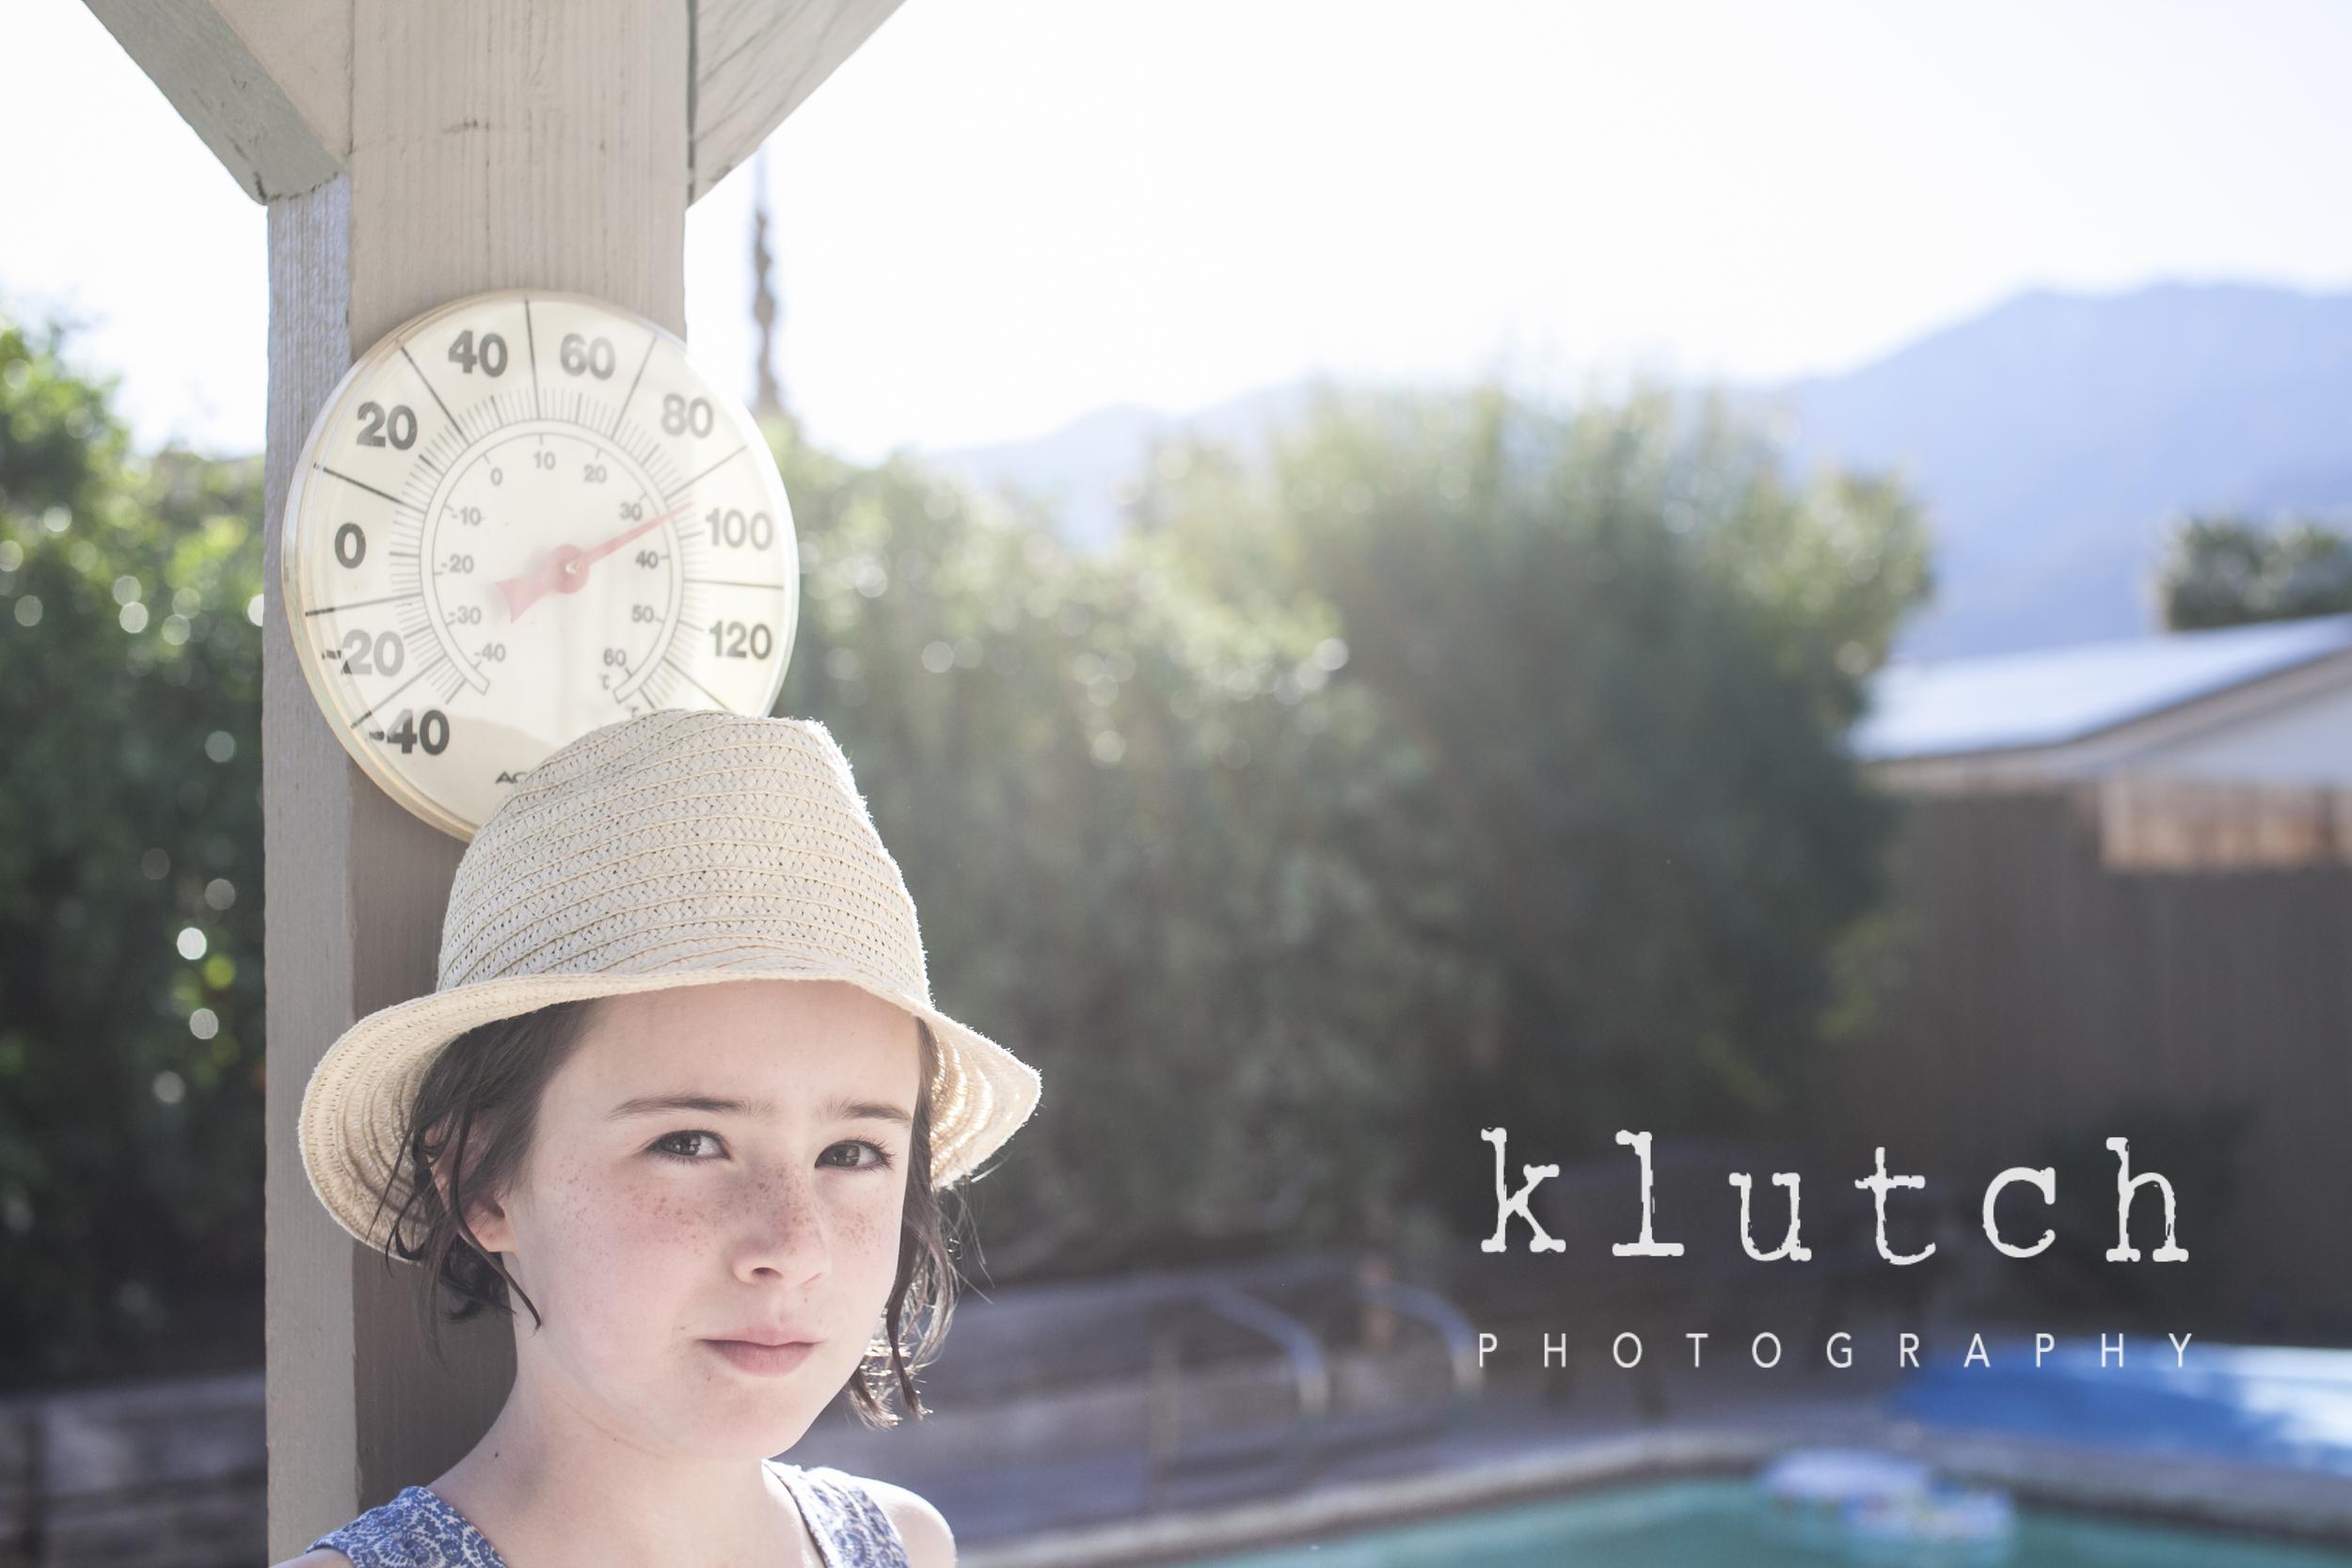 Klutch Photography,white rock family photographer, vancouver family photographer, whiterock lifestyle photographer, life unscripted photographer, life unscripted session, photography,Dina Ferreira Stoddard-1-17.jpg